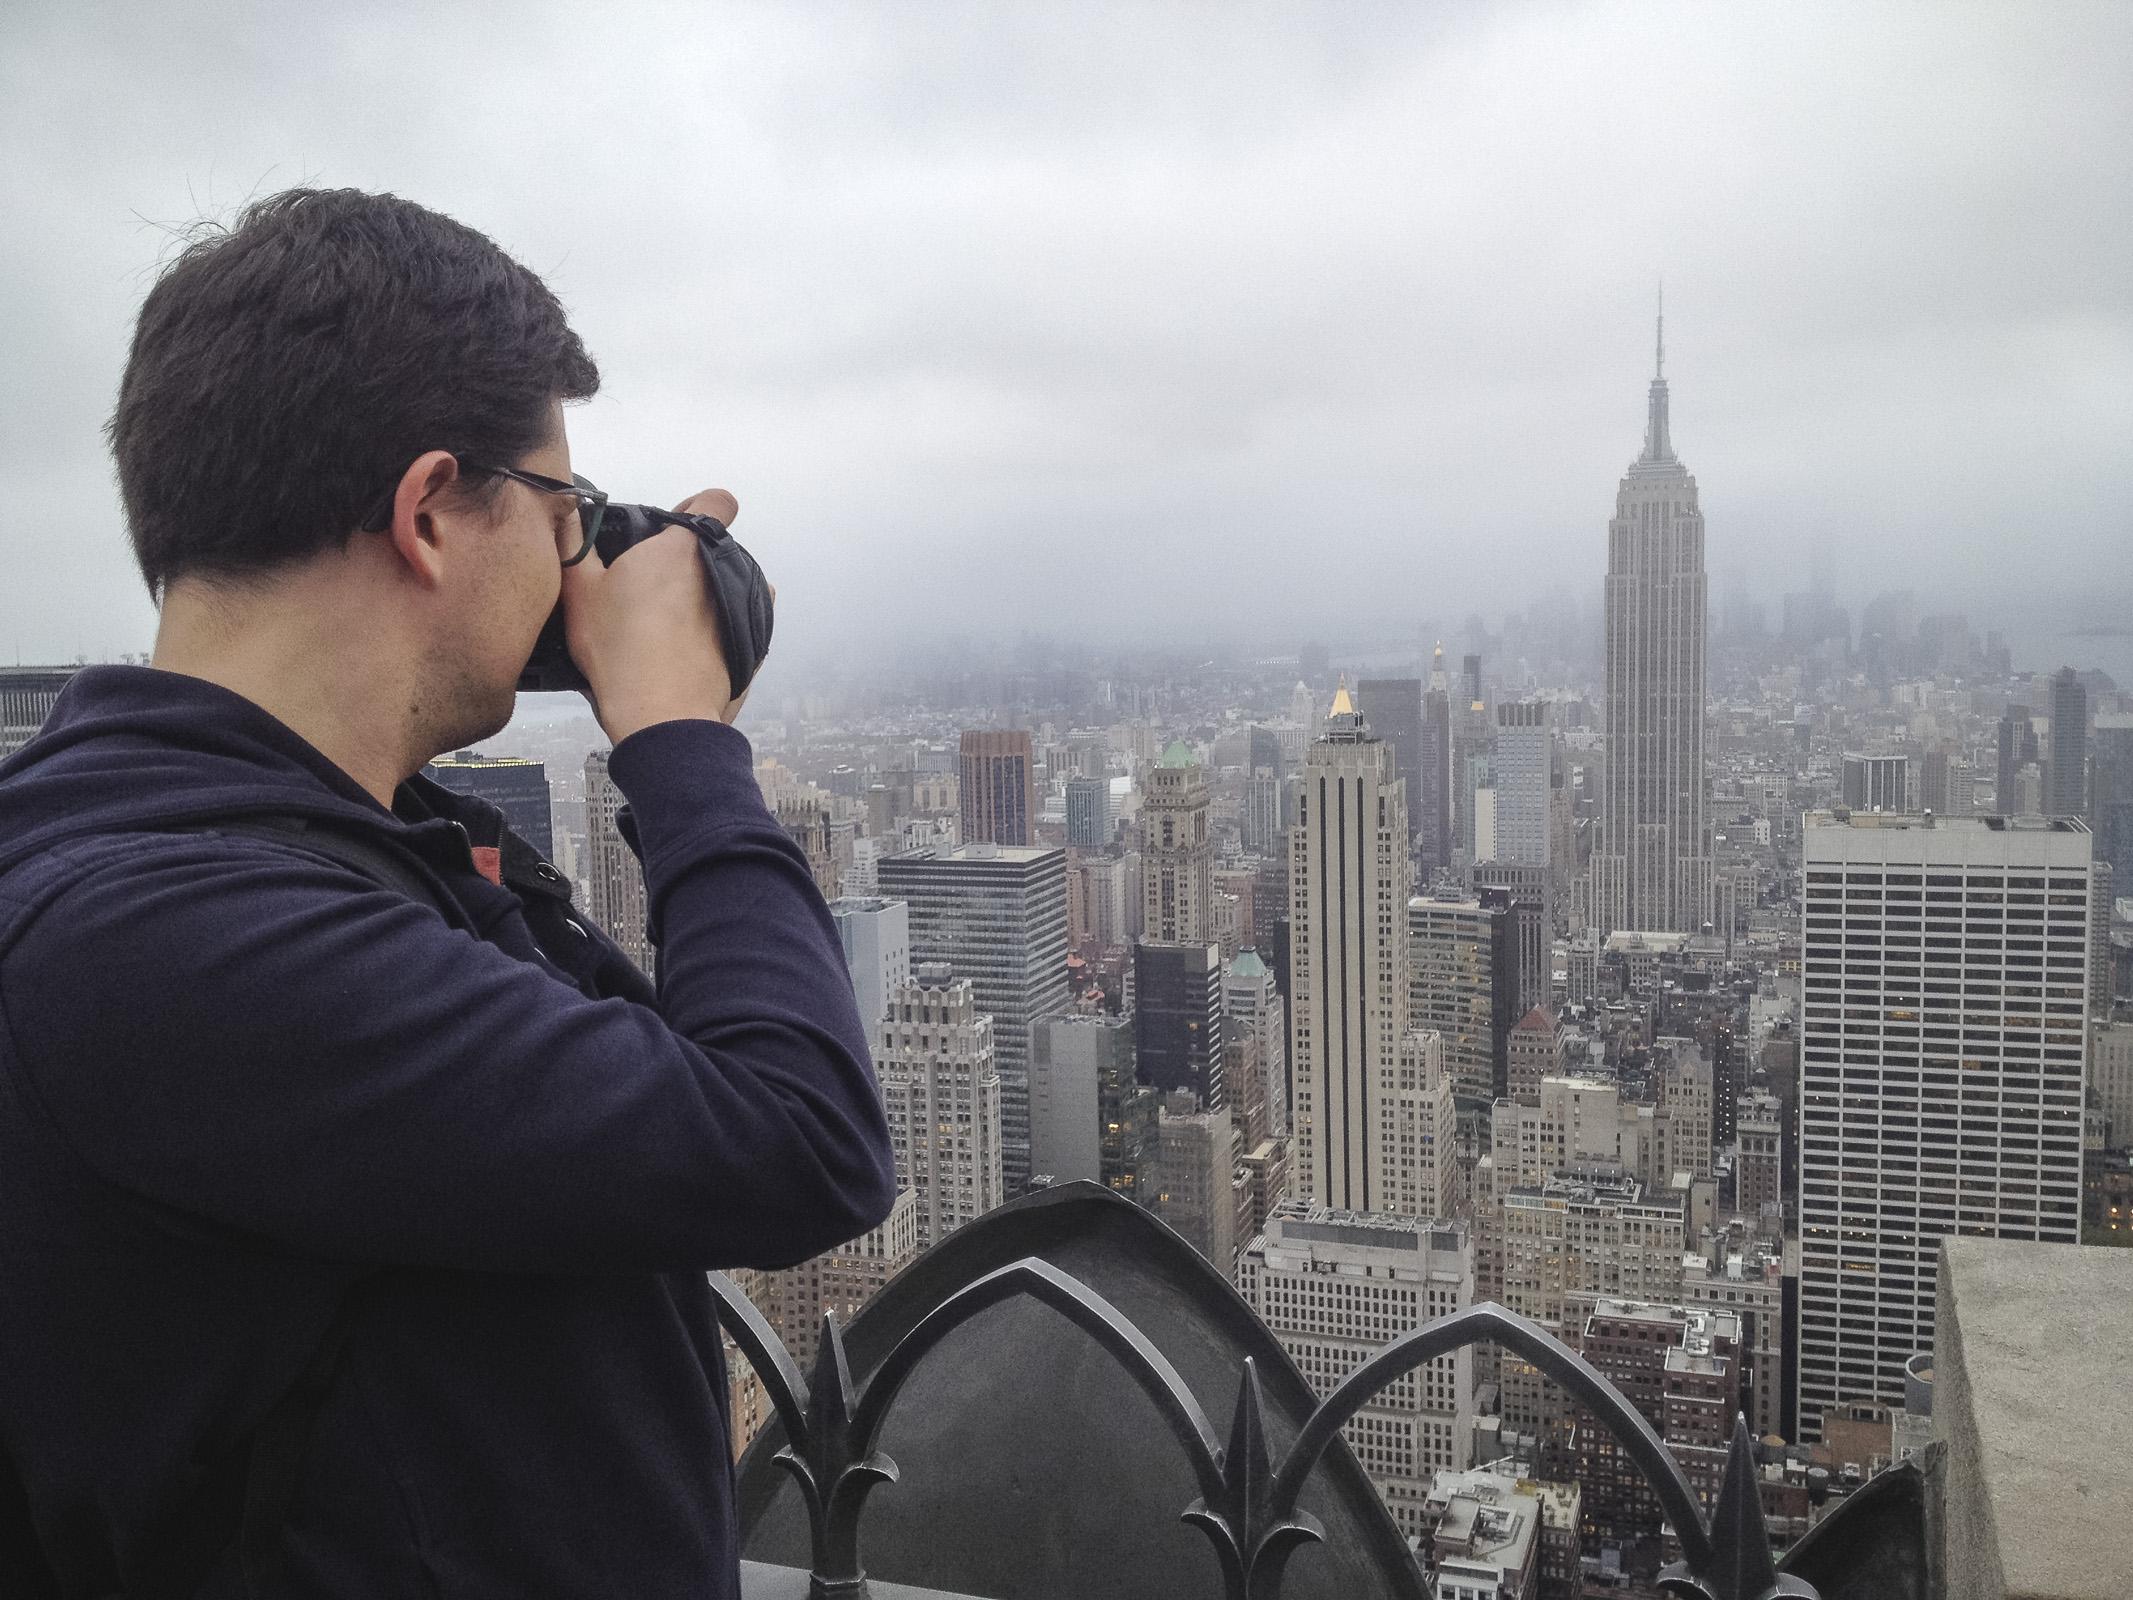 NYC2014-iphone-002.jpg